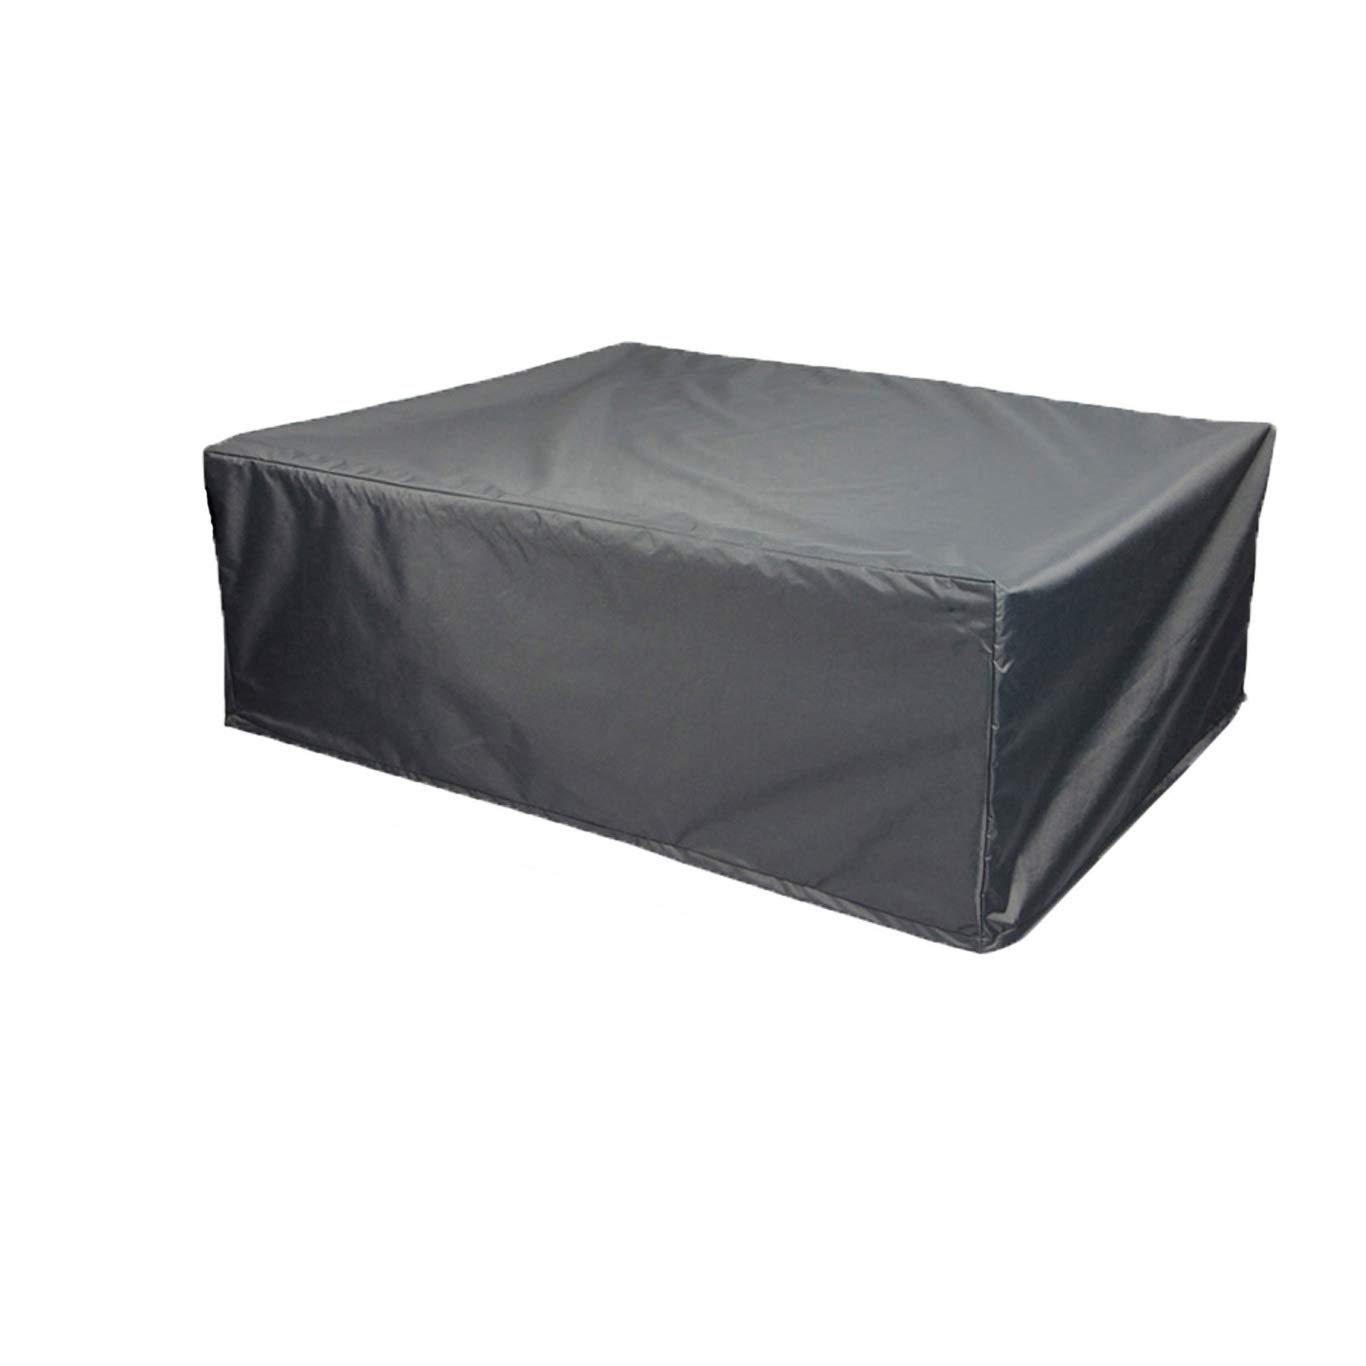 Hentex Cover Schutzhülle für Lounge Chair Gartenbank 2-Sitzer Abdeckung Loungesofa